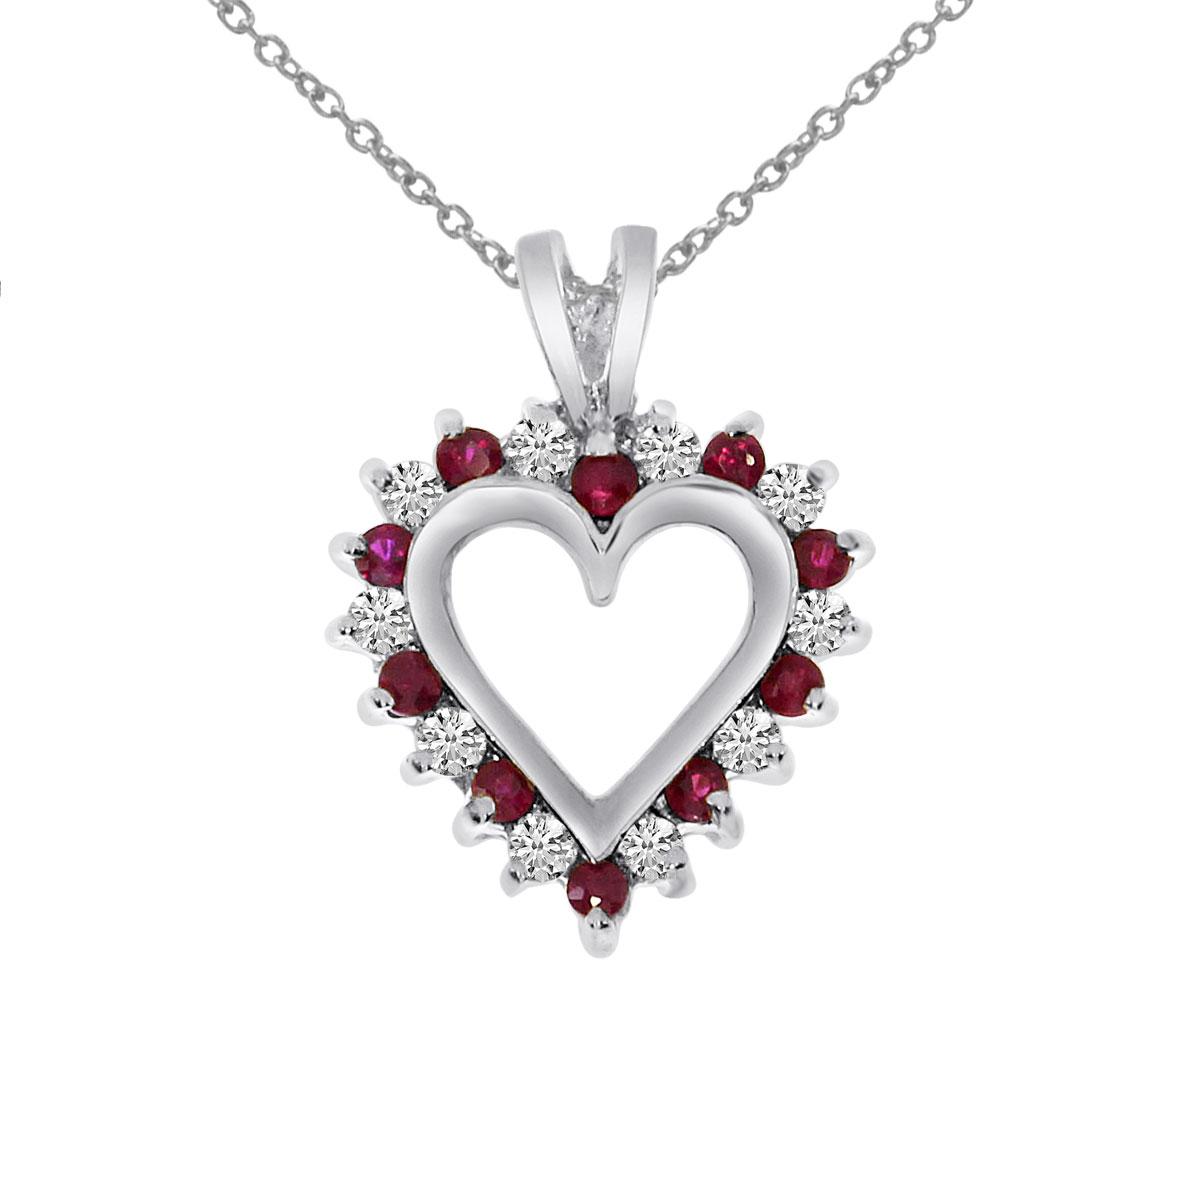 14k White Gold Ruby and Diamond Heart Shaped Pendant